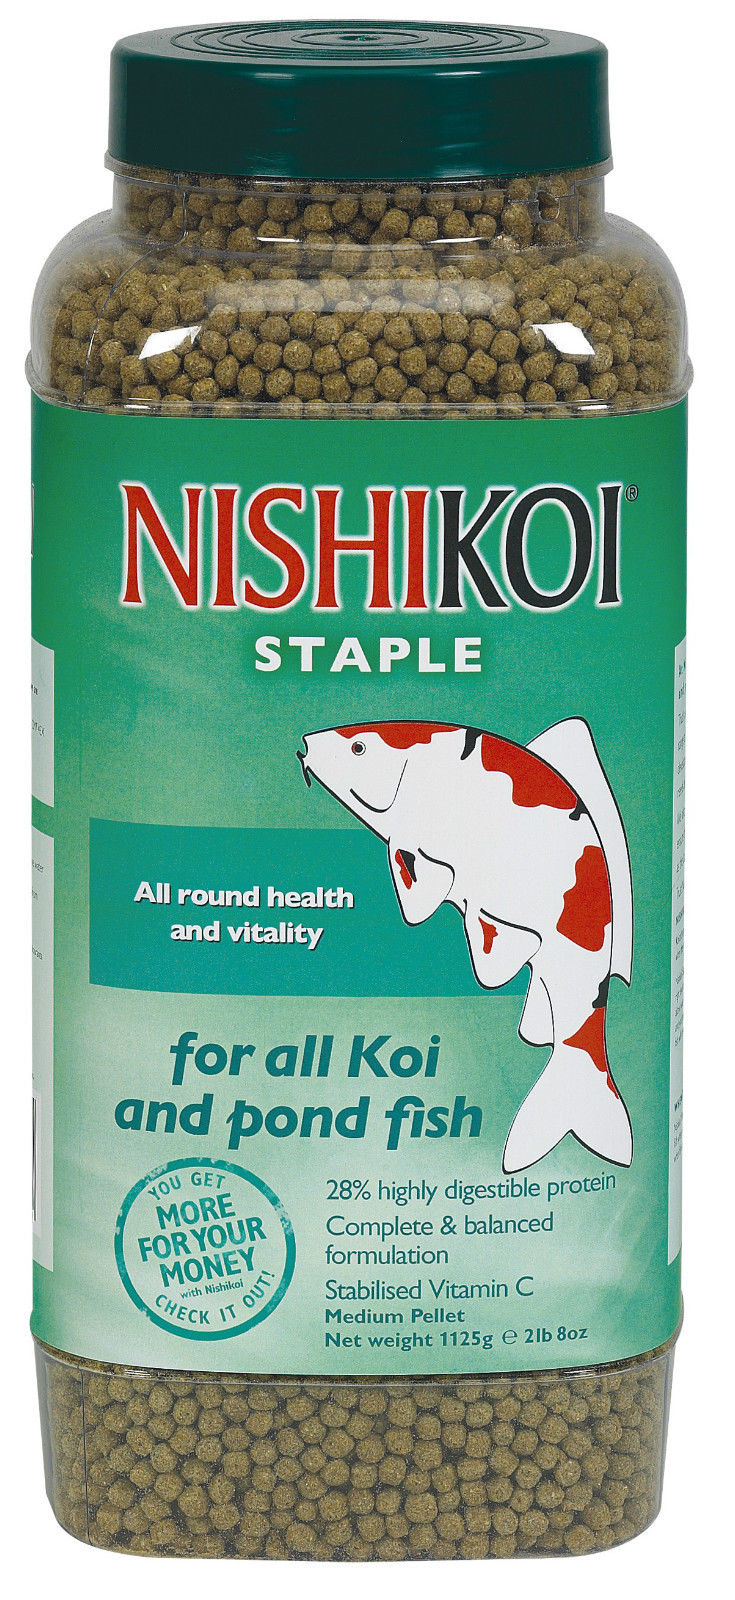 NISHIKOI-STAPLE-FISH-PELLET-FOOD-RANGE-POND-HEALTHY-PROTEIN-KOI-GOLDFISH-GARDEN